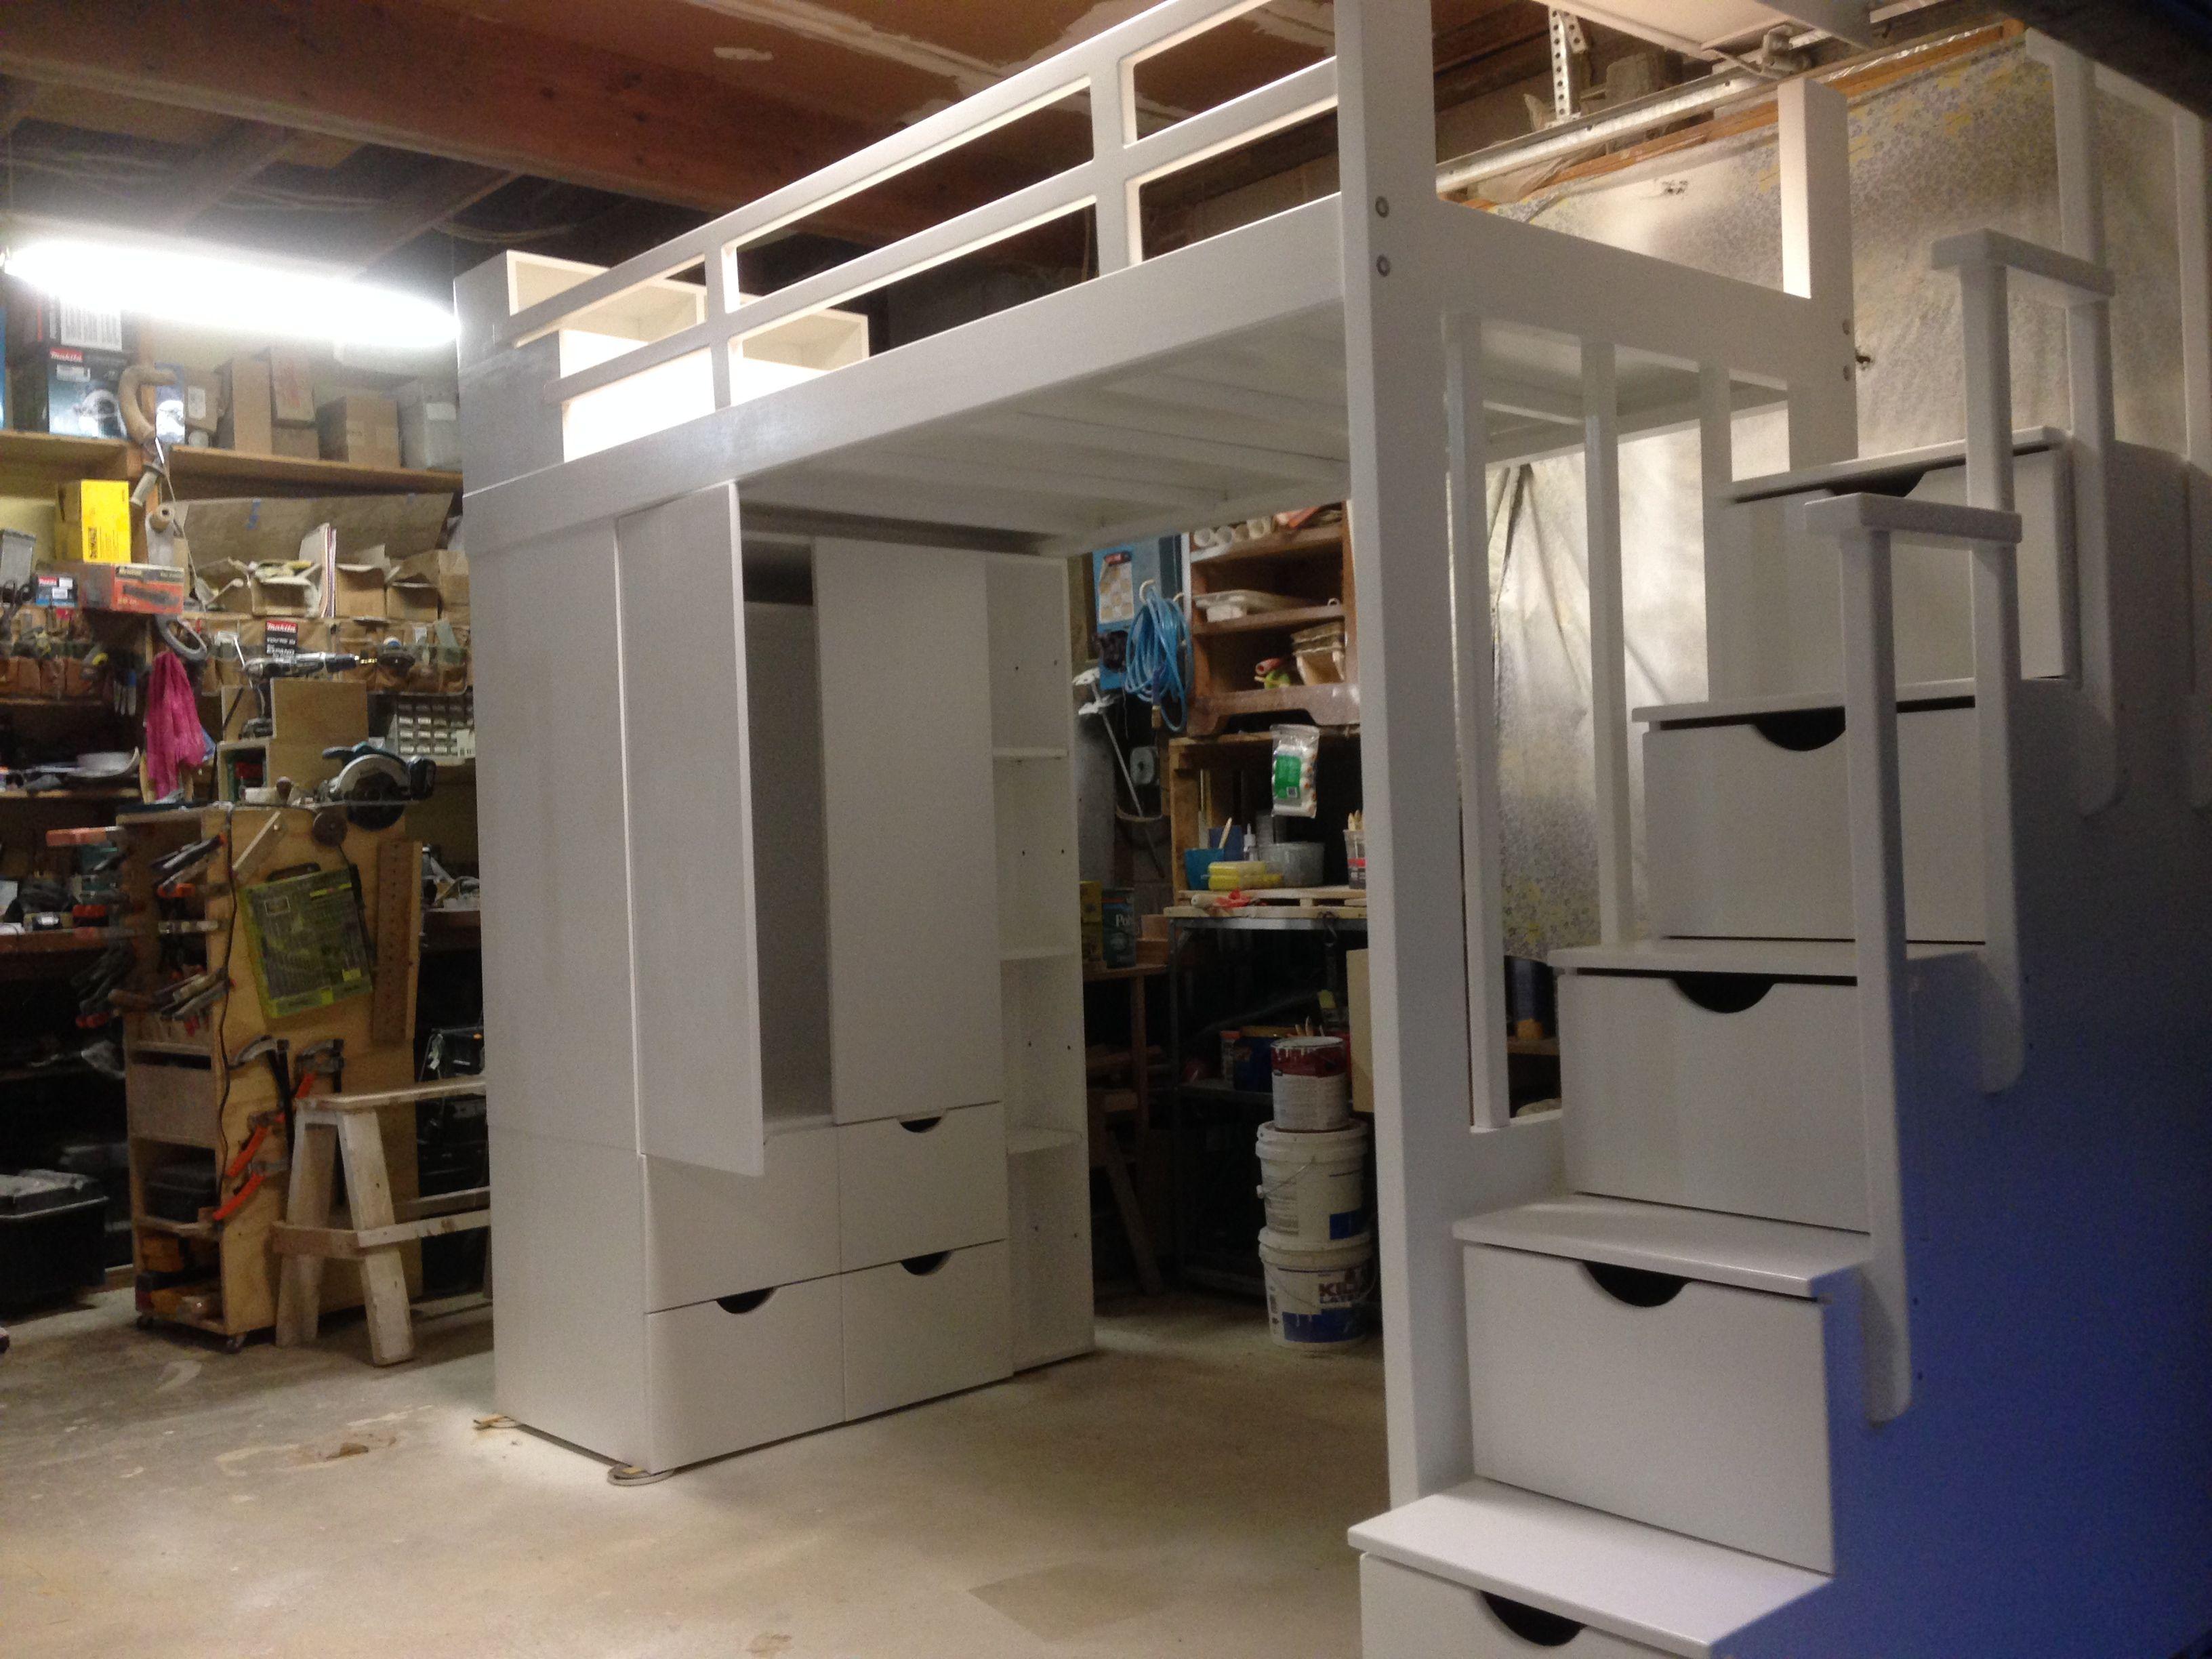 Wardrobe Loft Bed With Storage Steps Loft Bed Plans Diy Loft